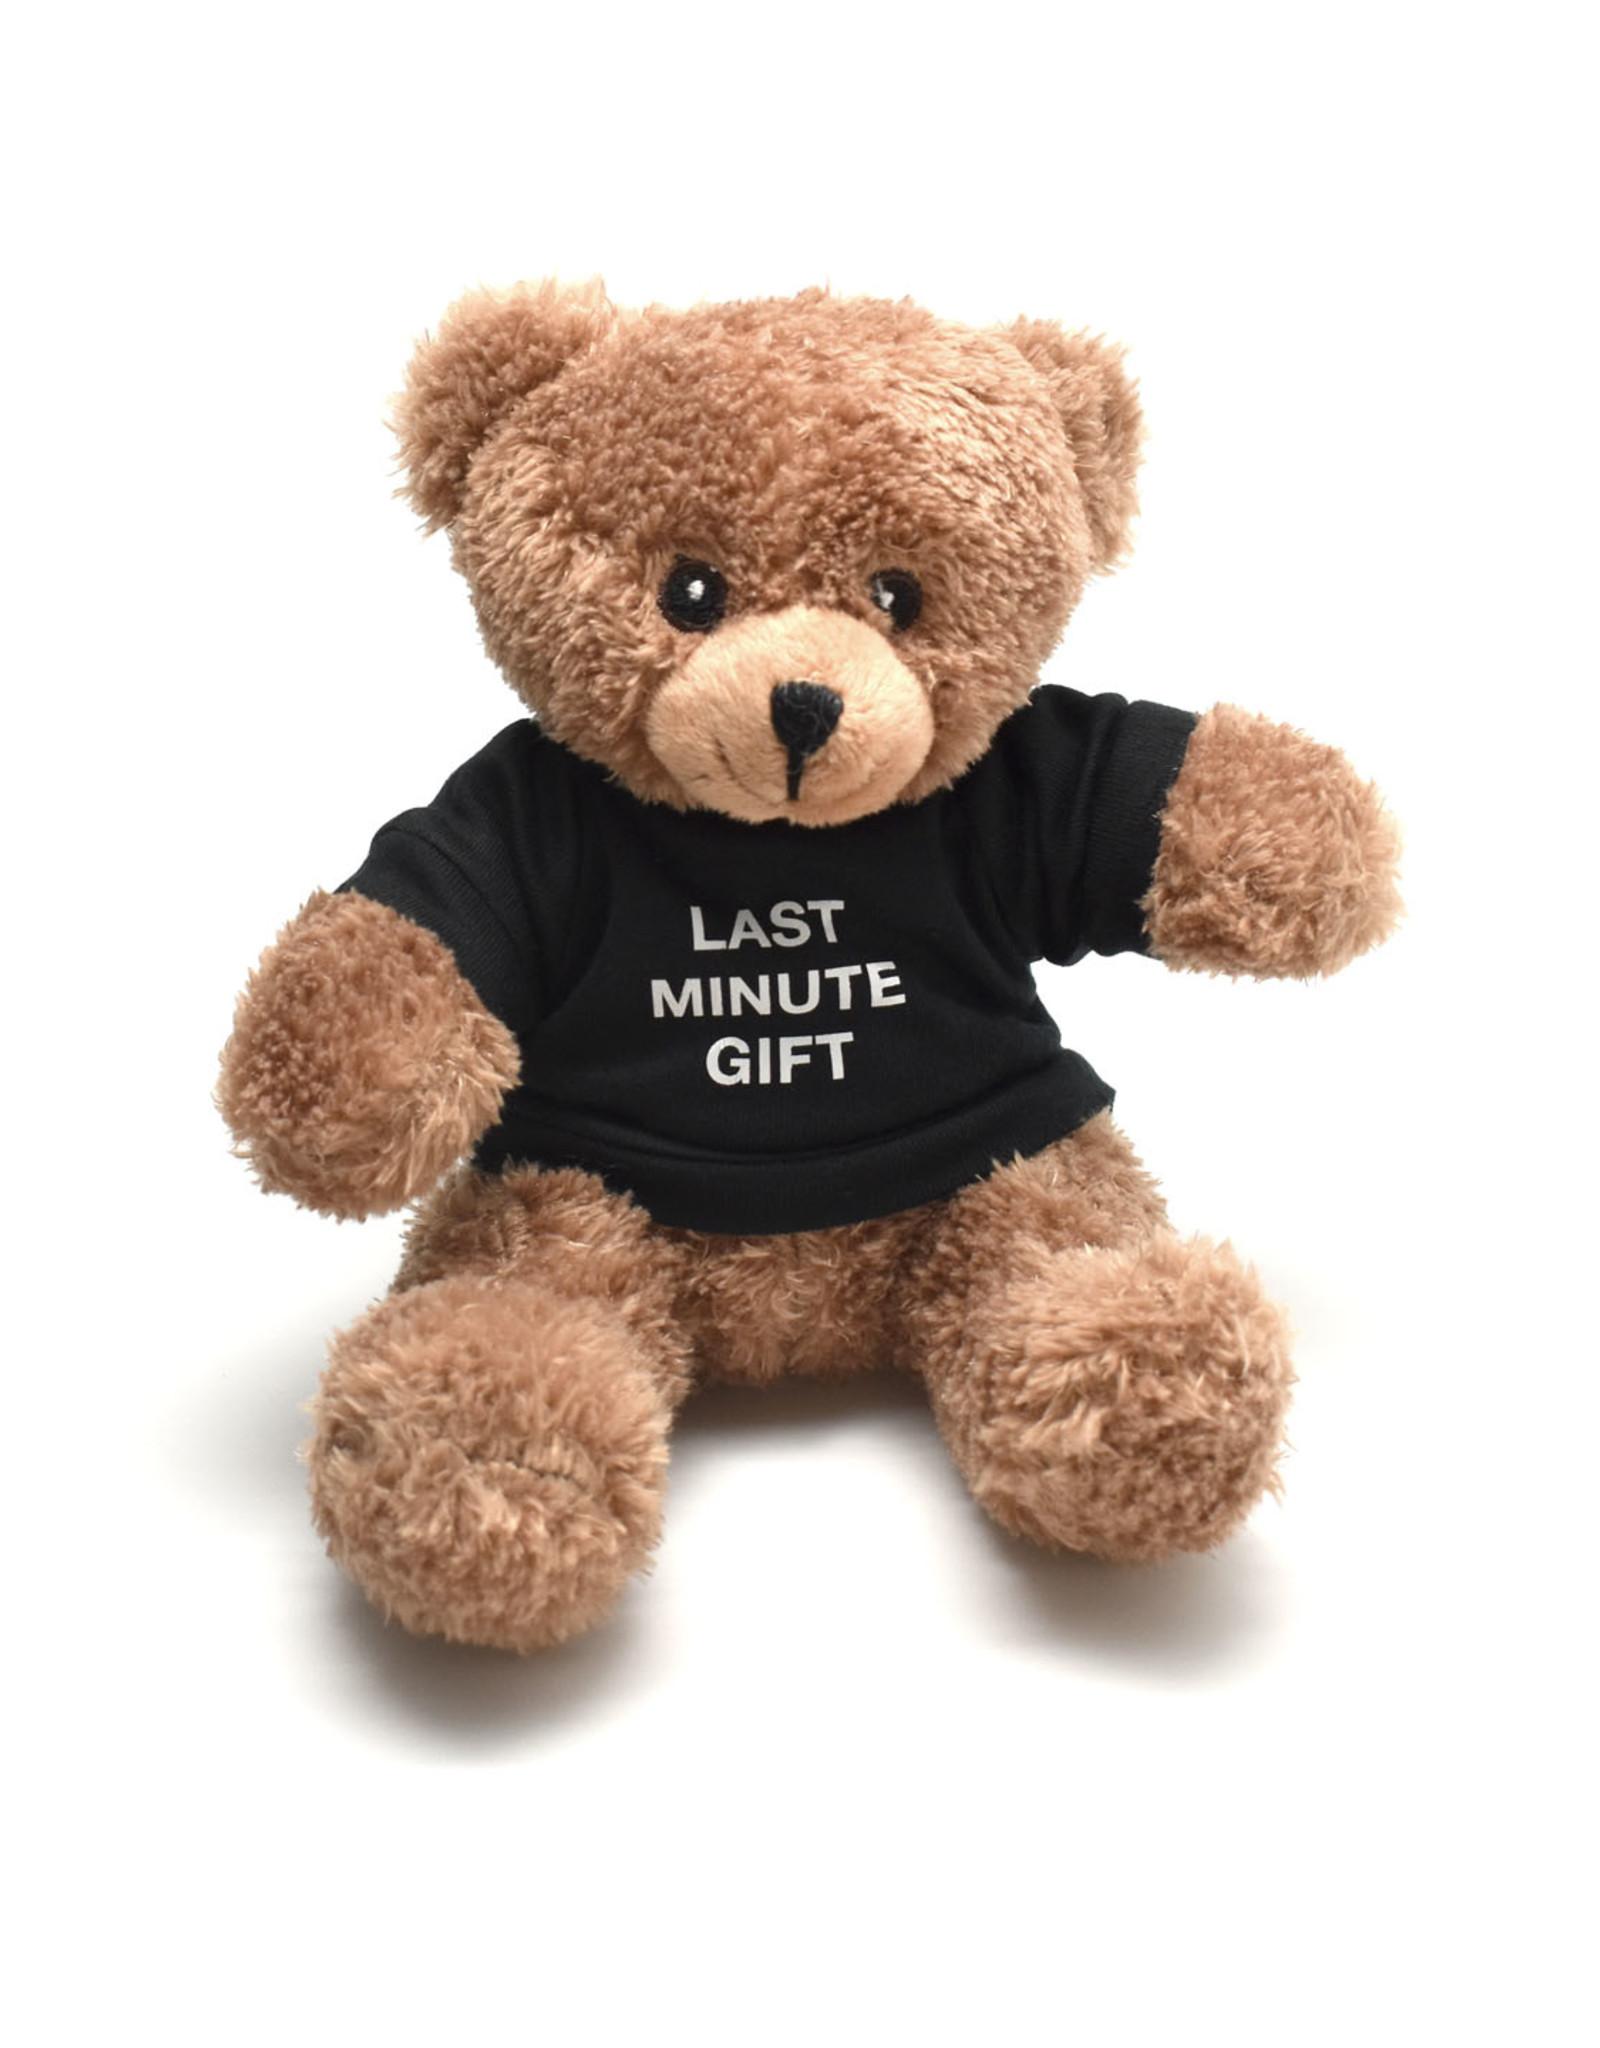 Last Minute Gift Teddy Bear